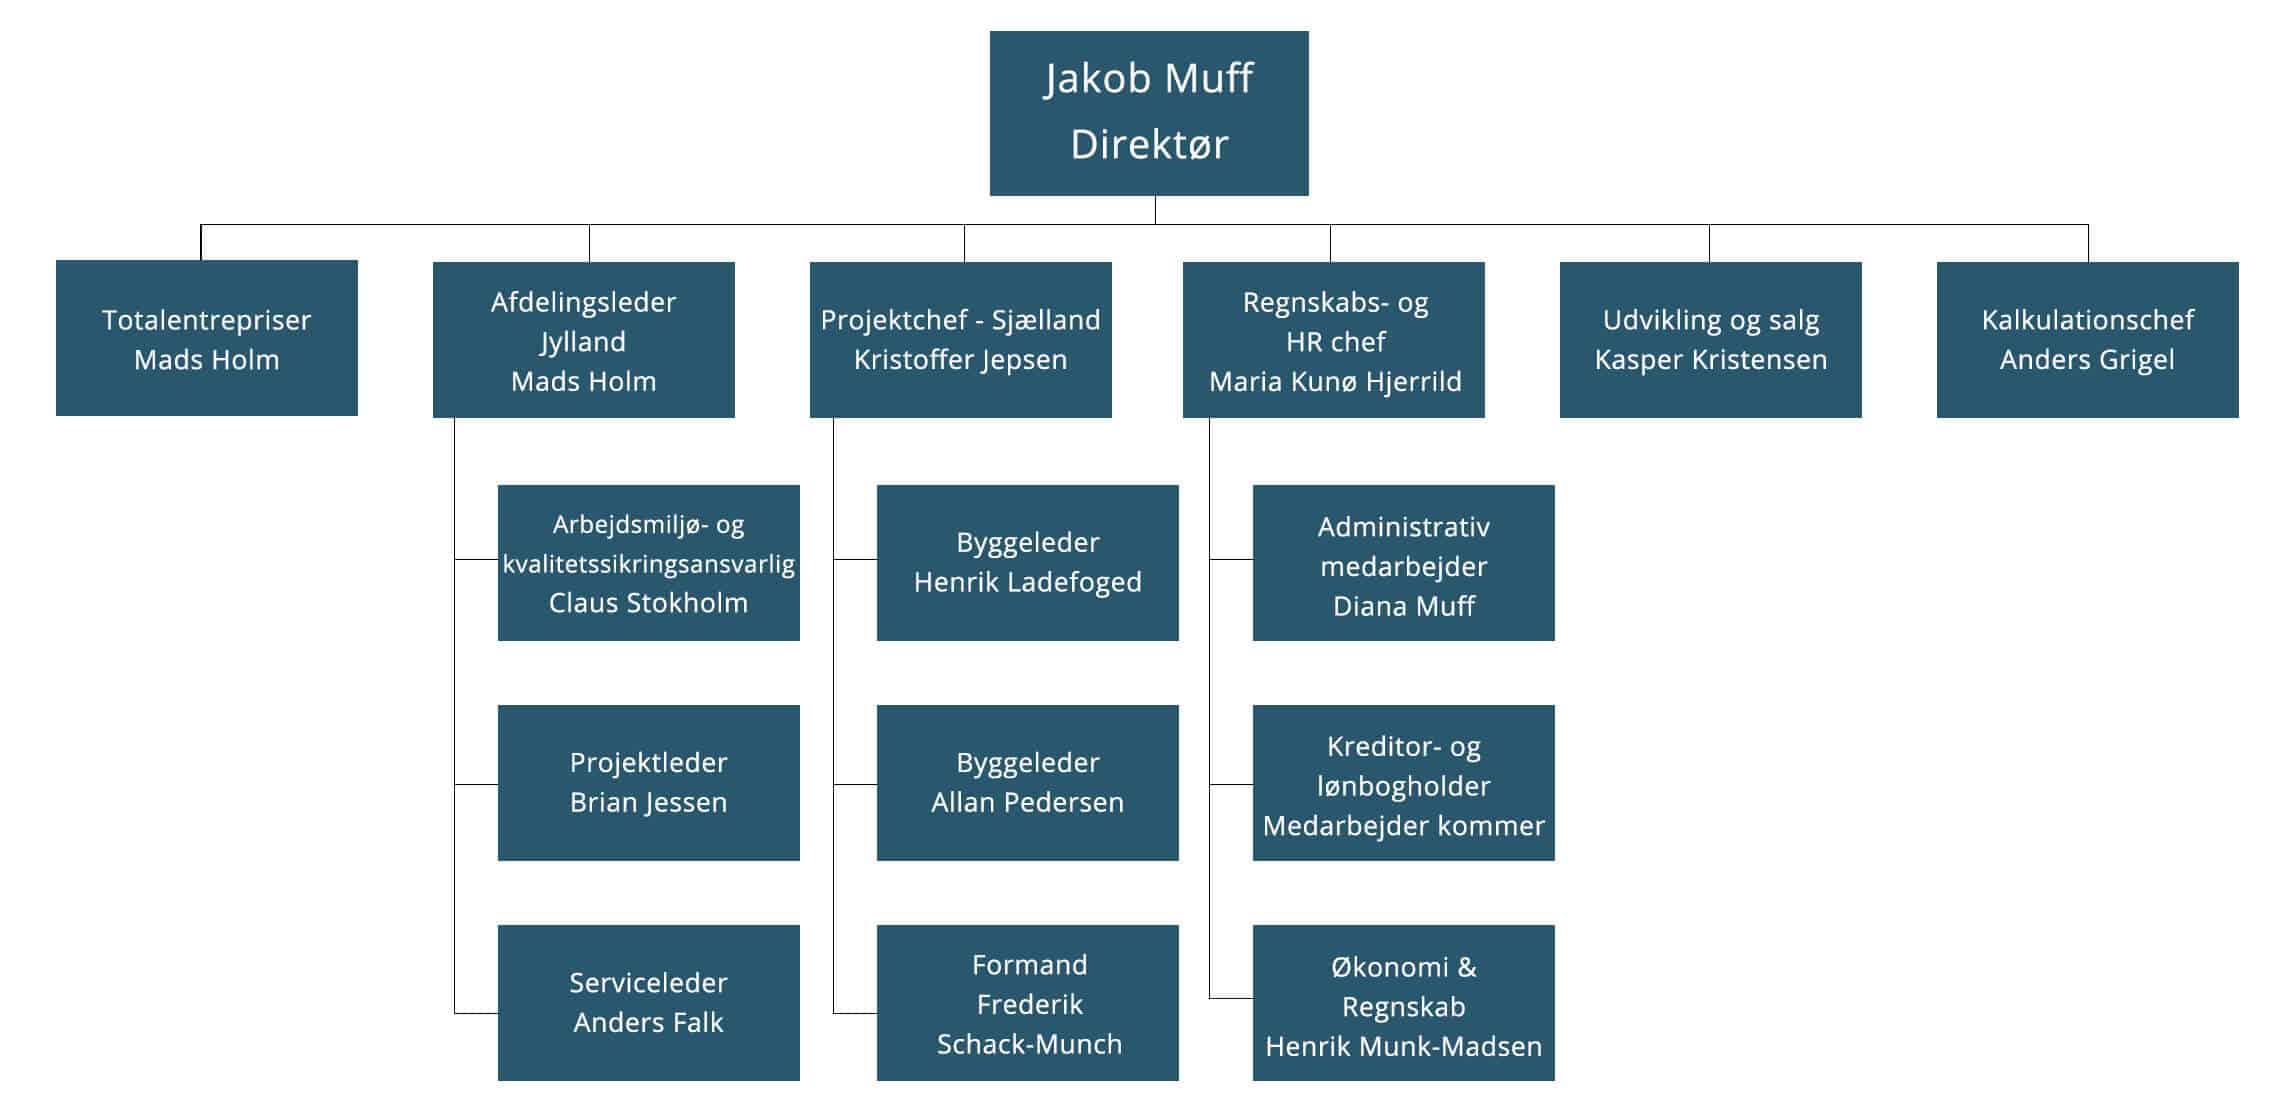 Organisationsdiagram MUFFBYG